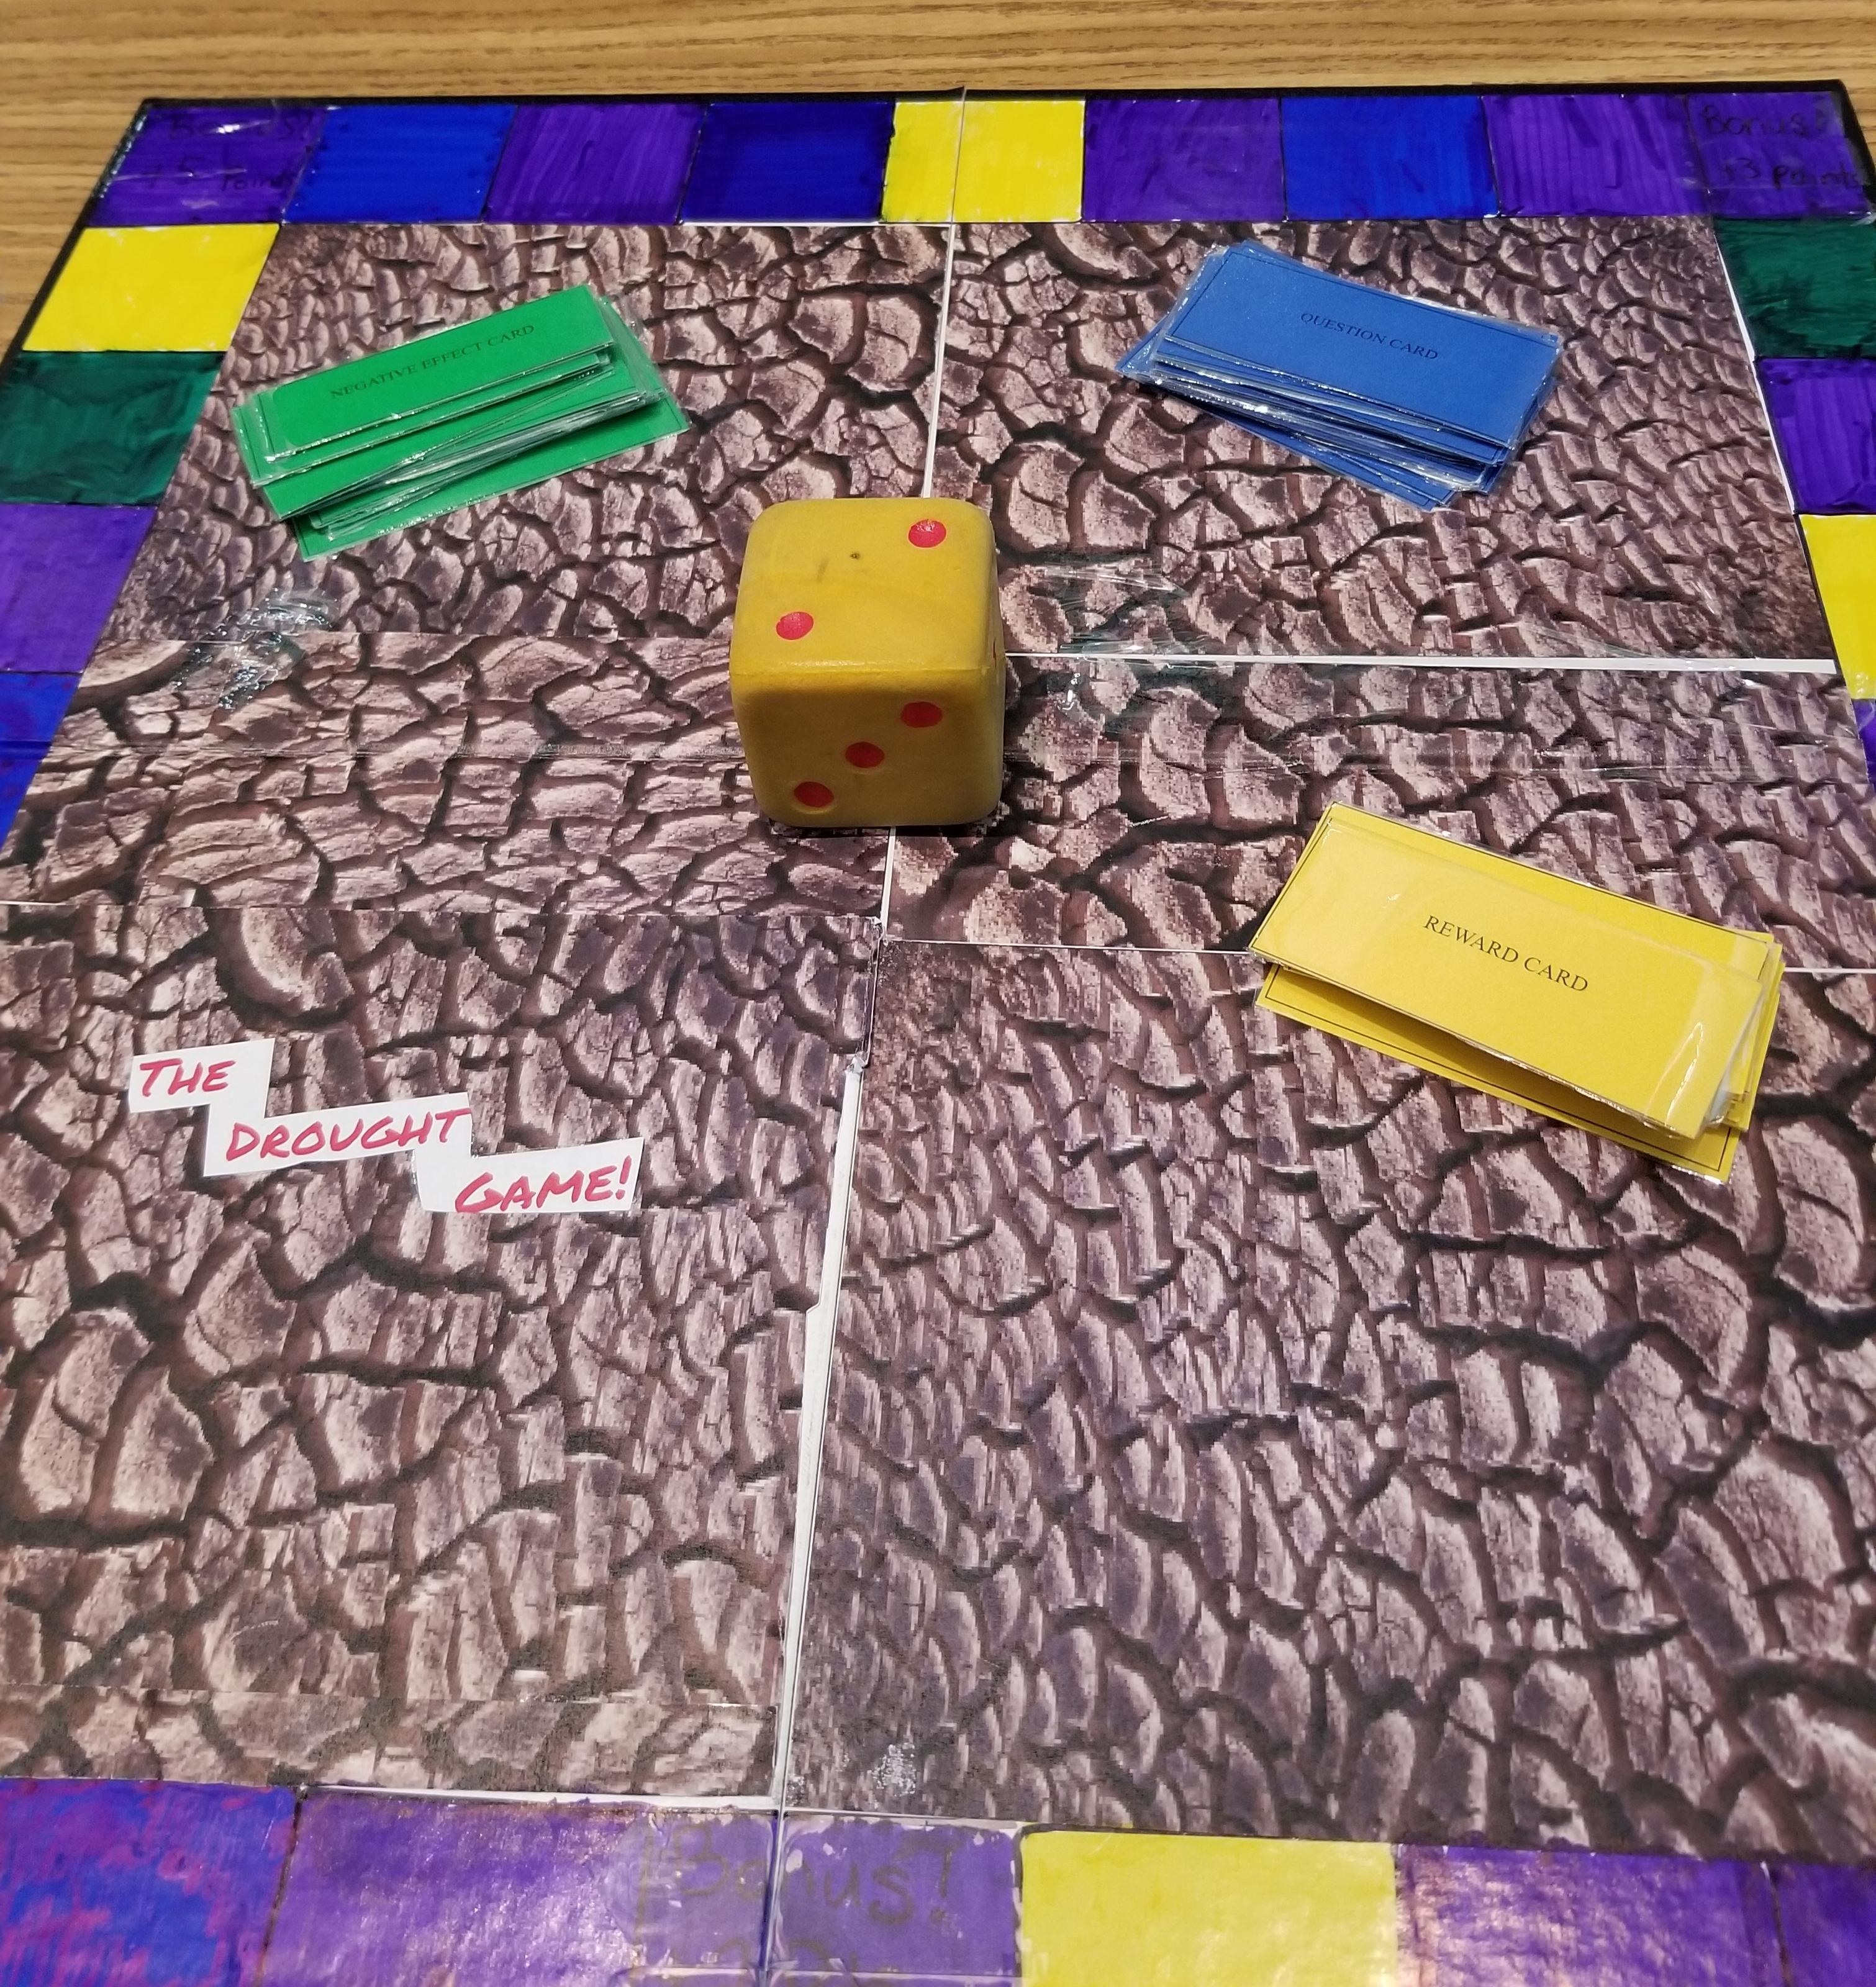 STEM Droughtgameboard